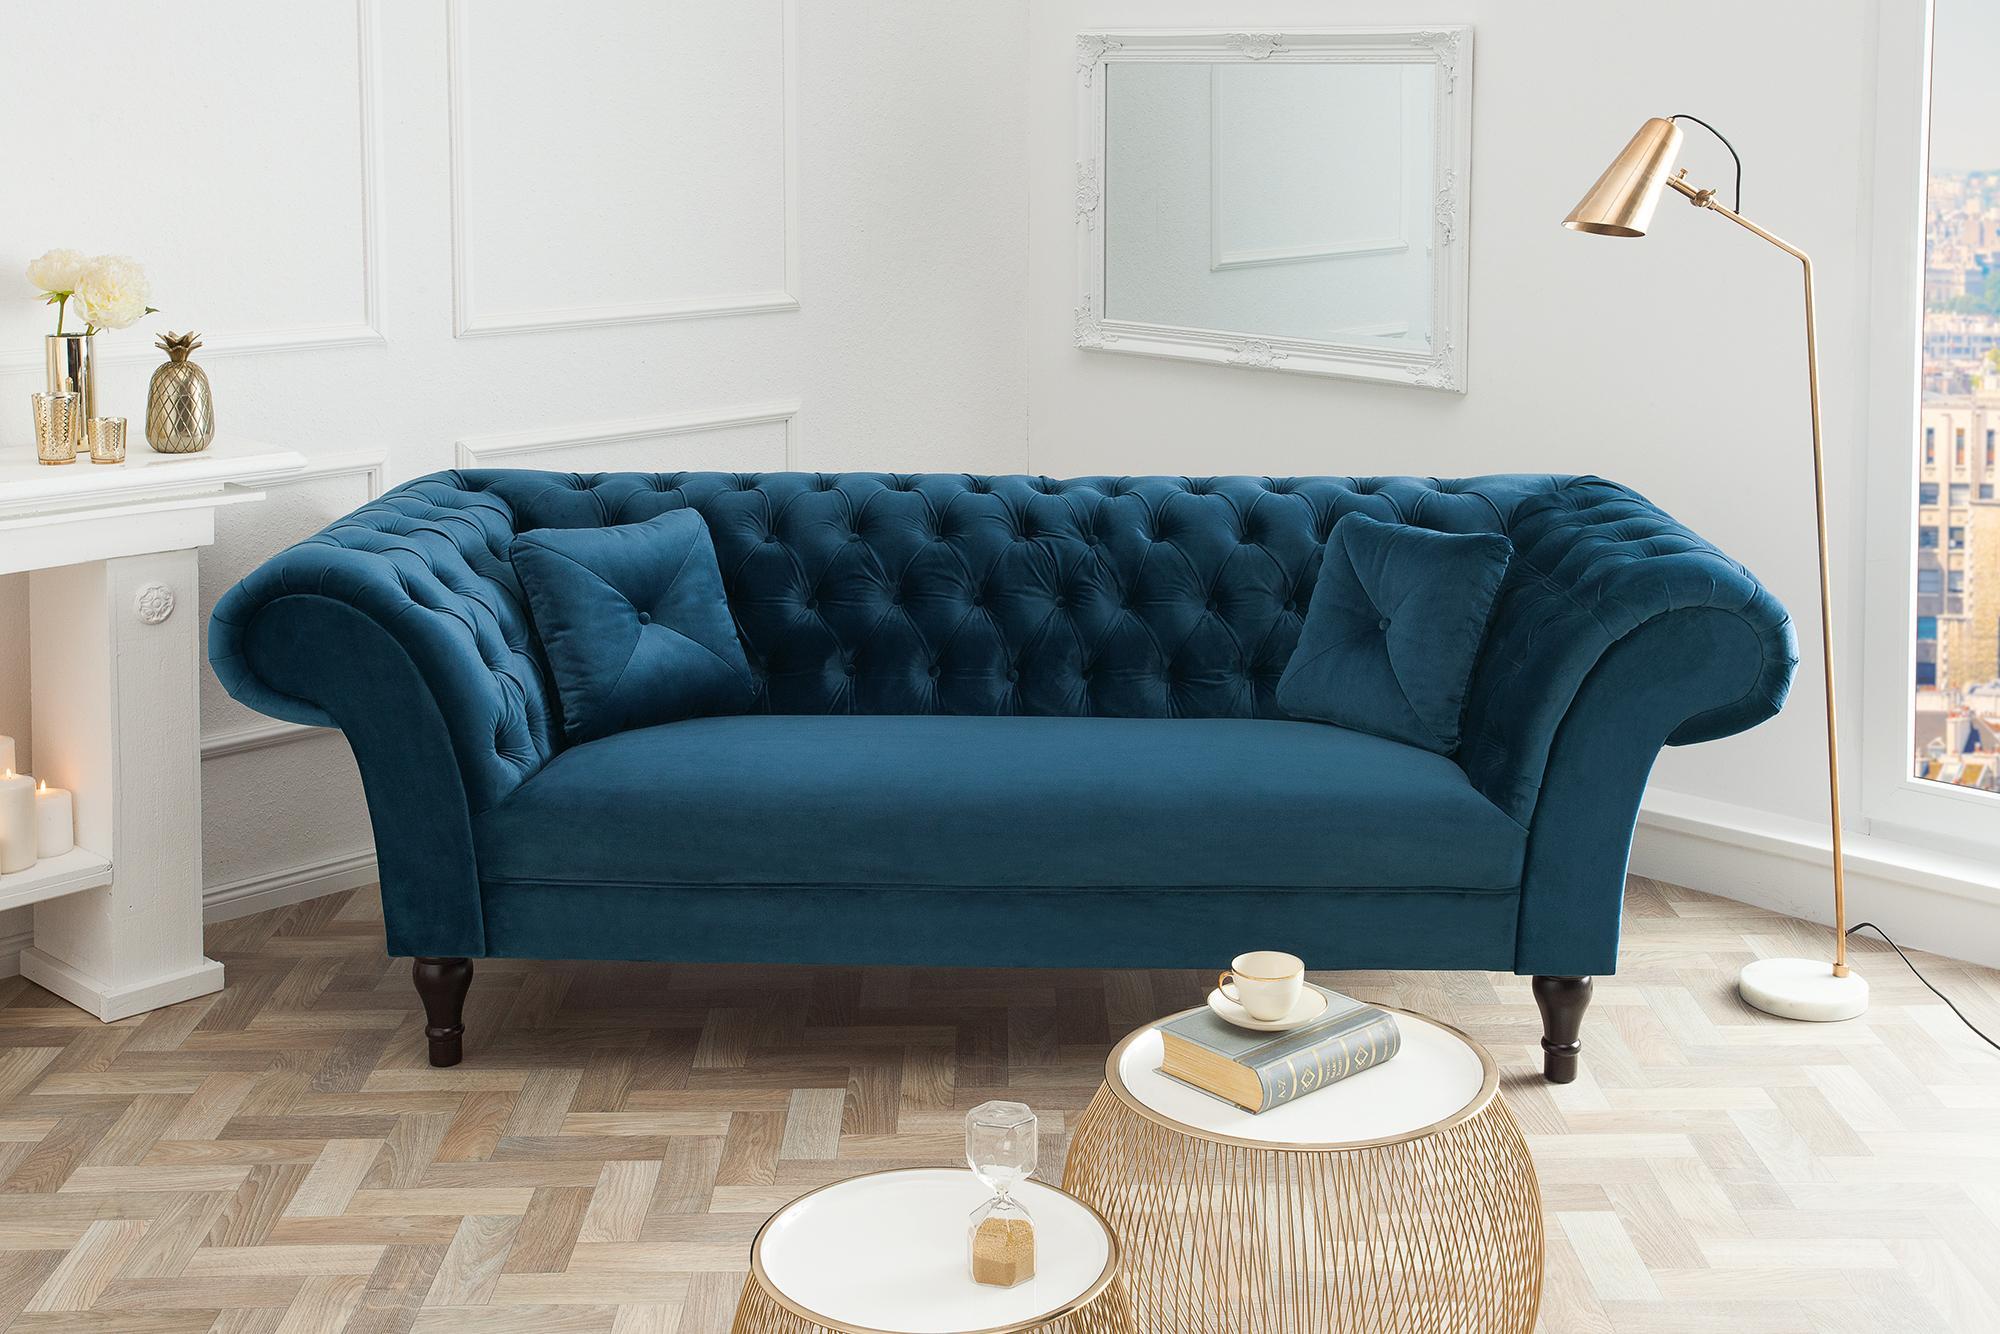 https://www.inventio.info.pl/12375/sofa-euphoria-samt-38217.jpg